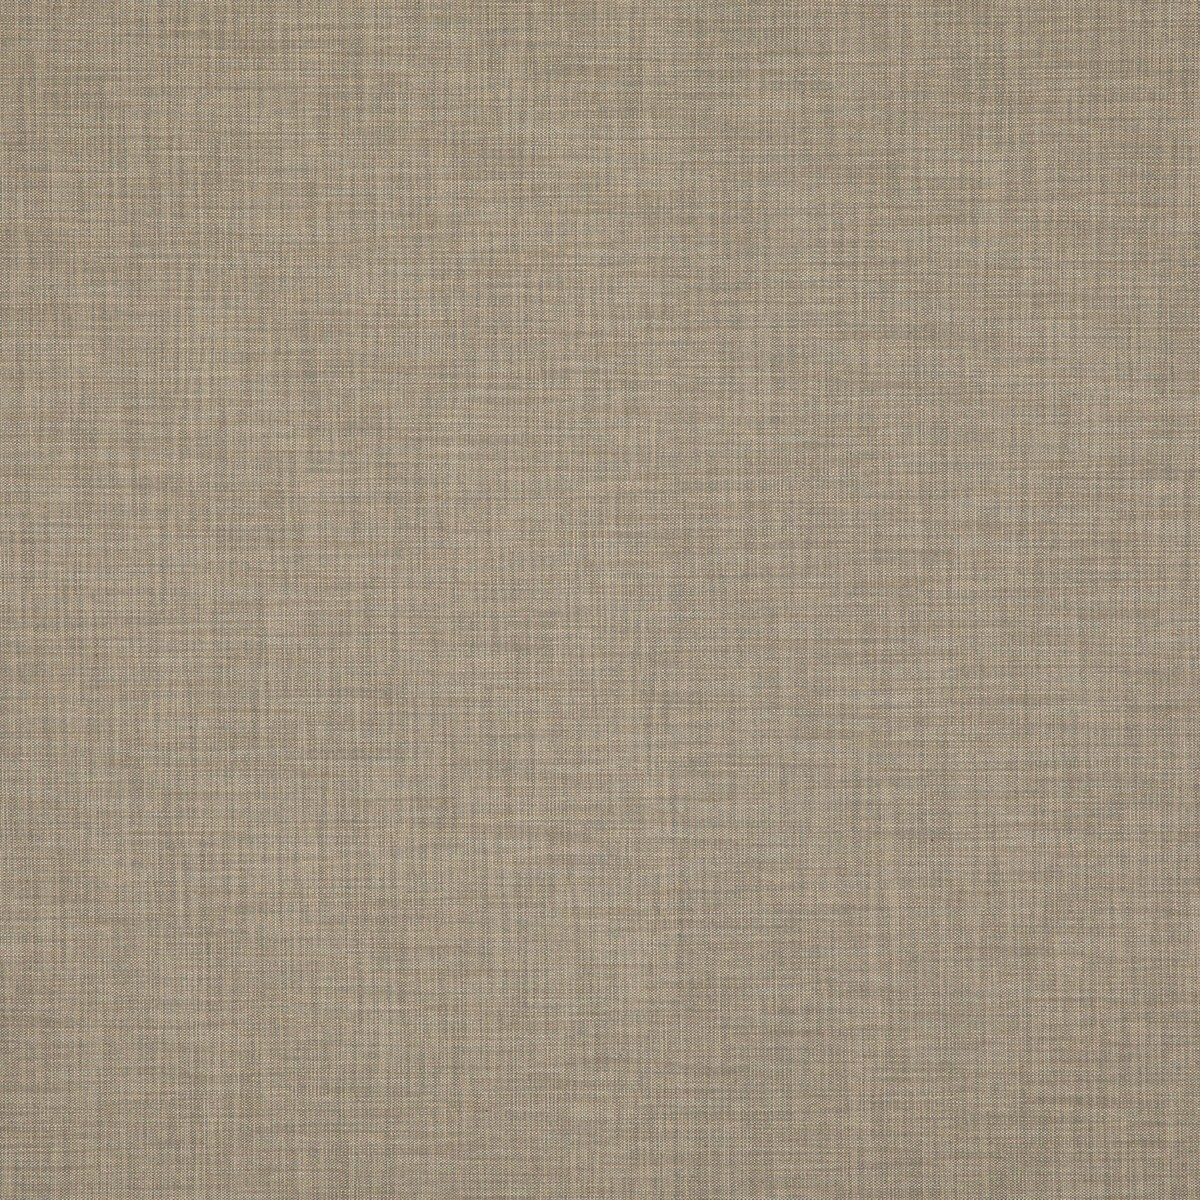 Threads Kalahari Ed85316 705 Fabric Mineral